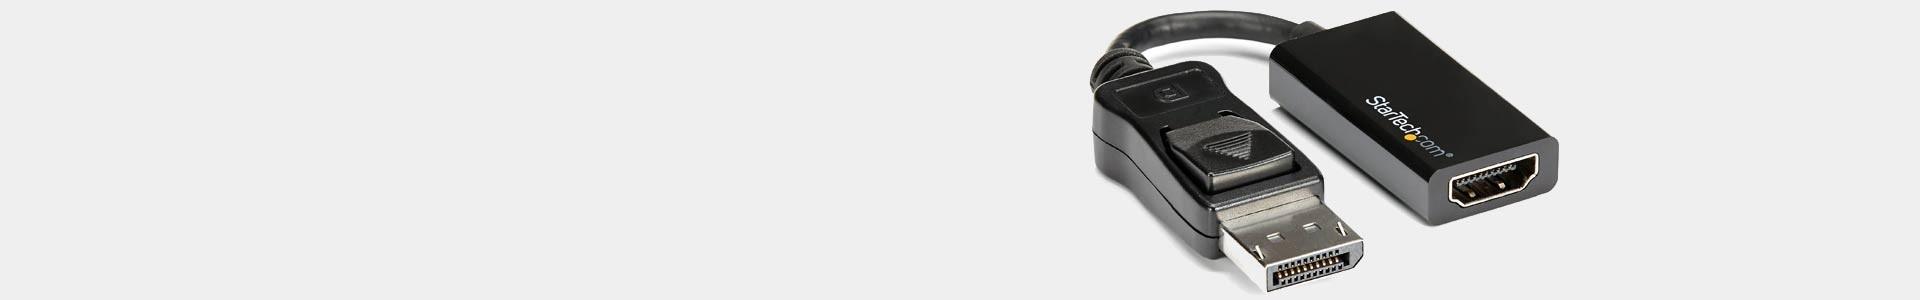 Professional DisplayPort adapters - Guaranteed quality - Avacab